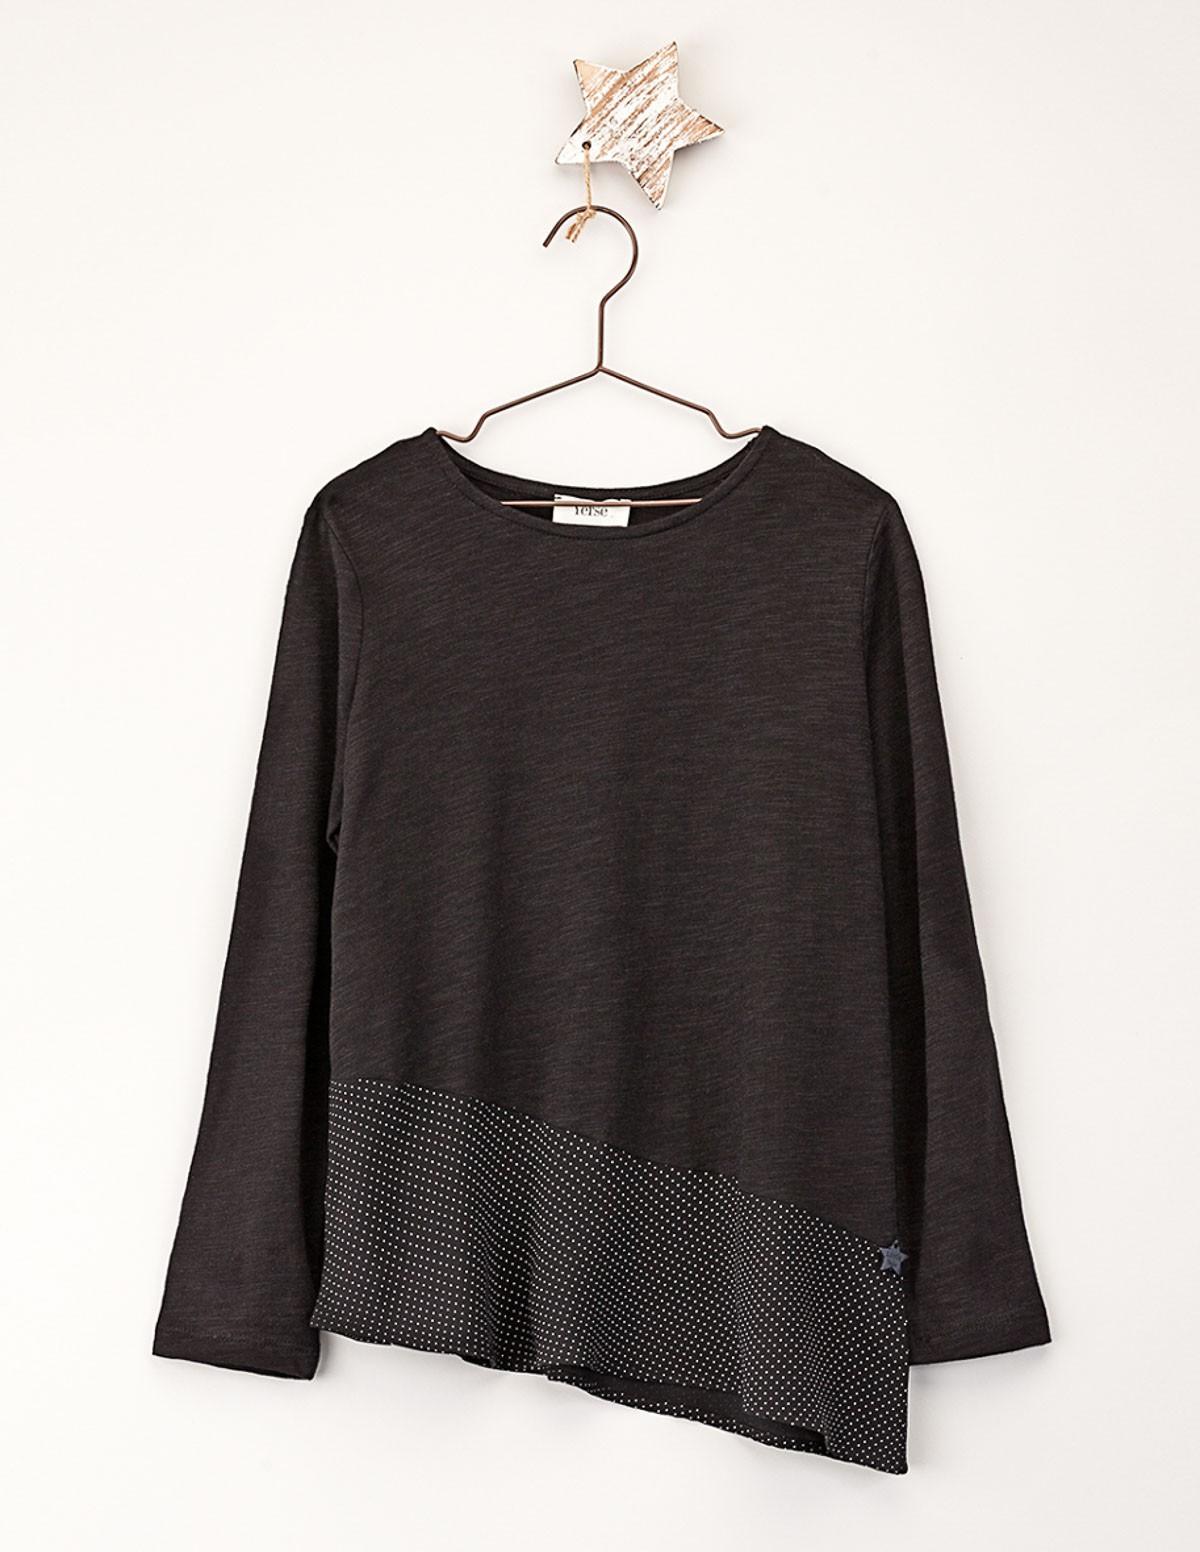 Camiseta bajo asimétrico